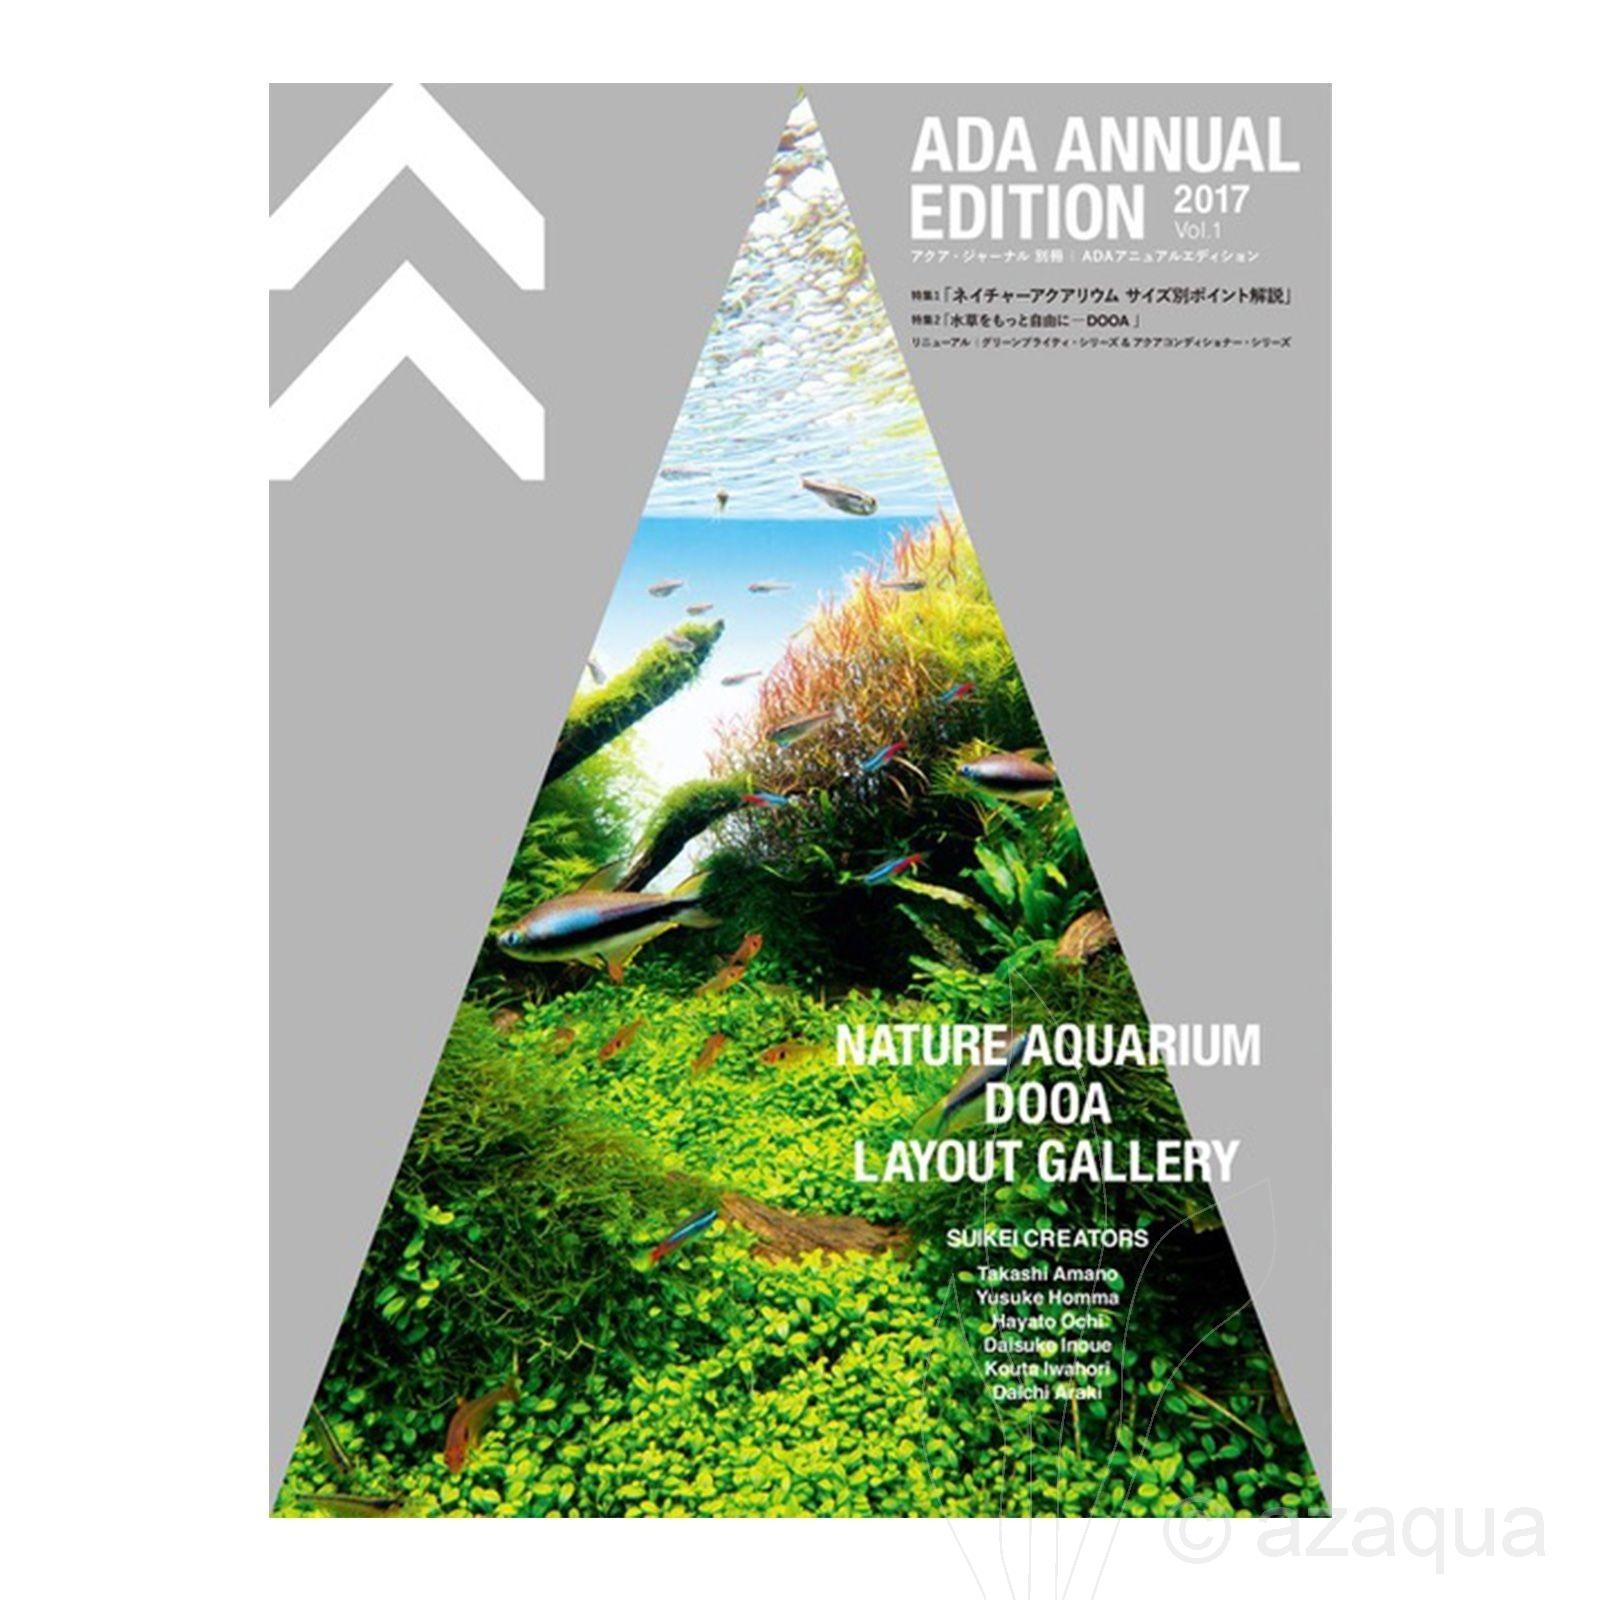 ADA Annual Edition 2017